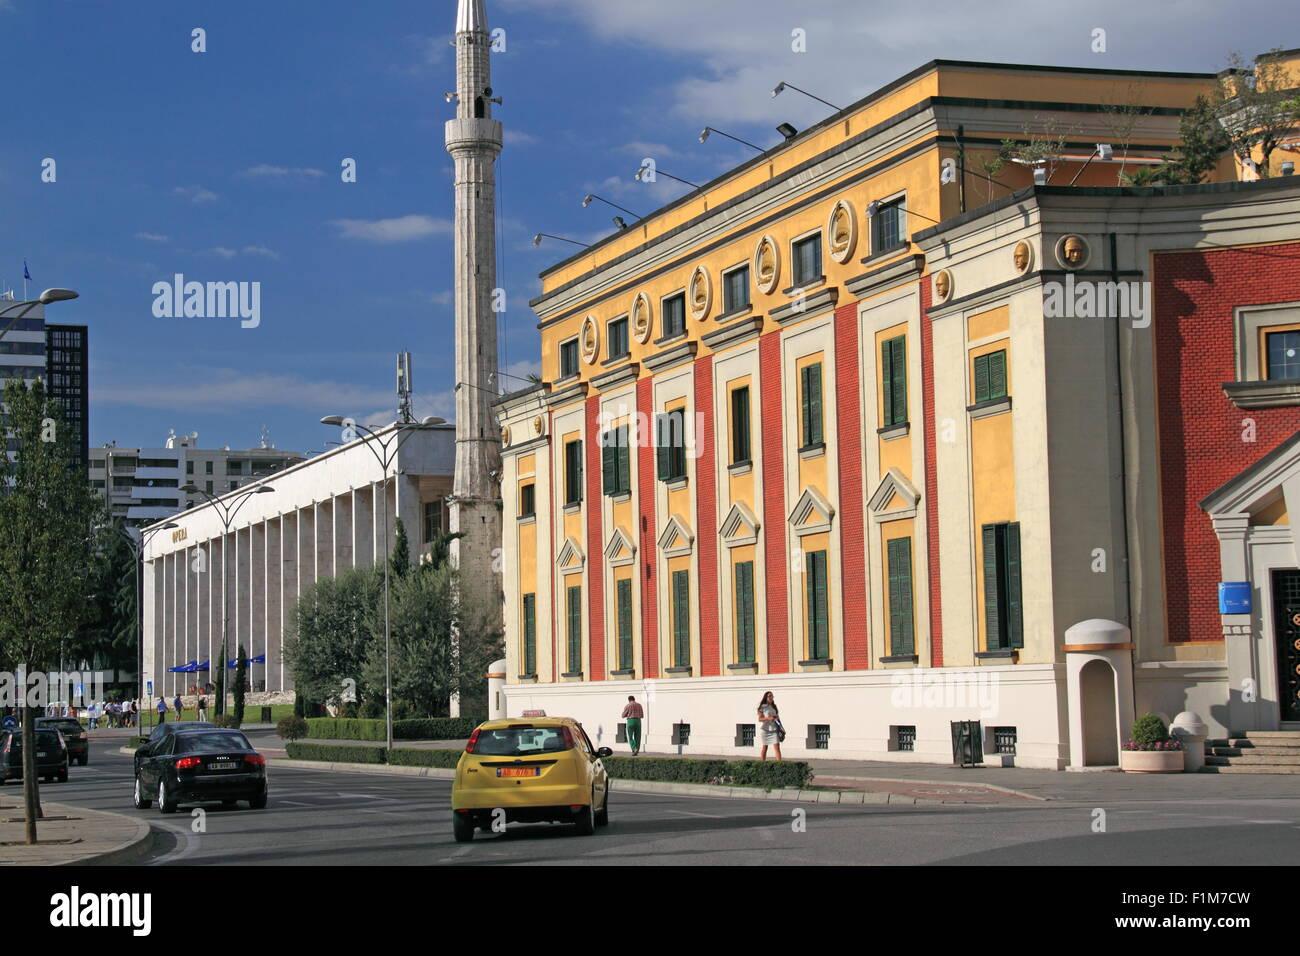 National Theatre of Opera and Ballet (left) and City Hall, Skanderbeg Square, Tirana, Albania, Balka - Stock Image